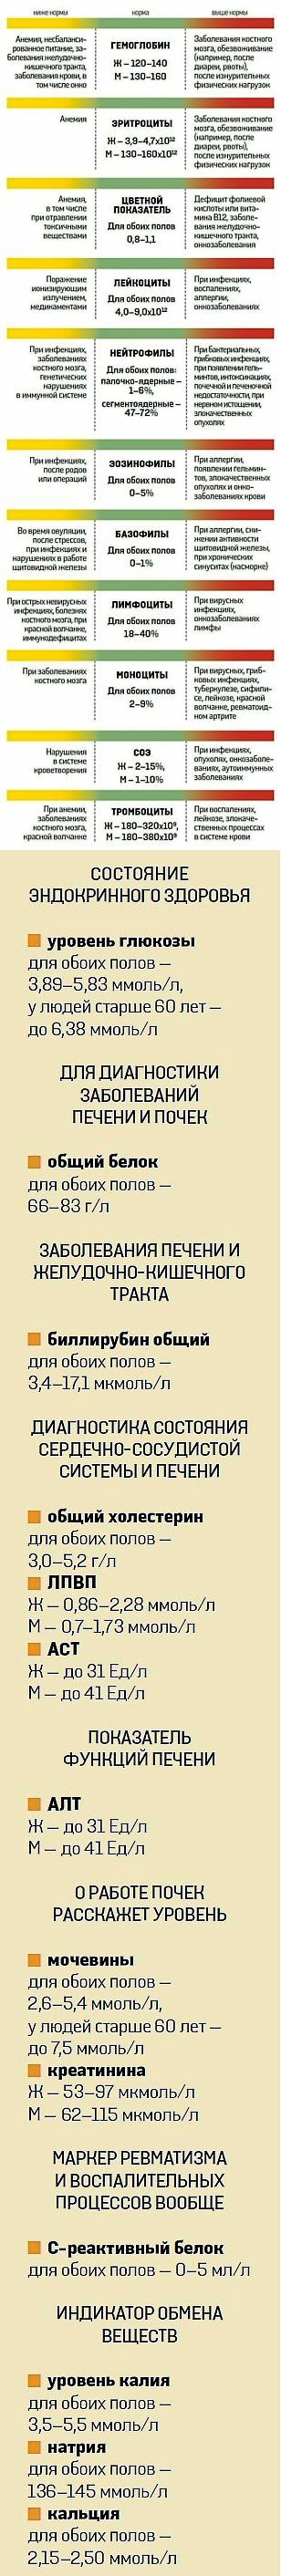 Валентина Ершова(Яковлева): от болезней | Постила